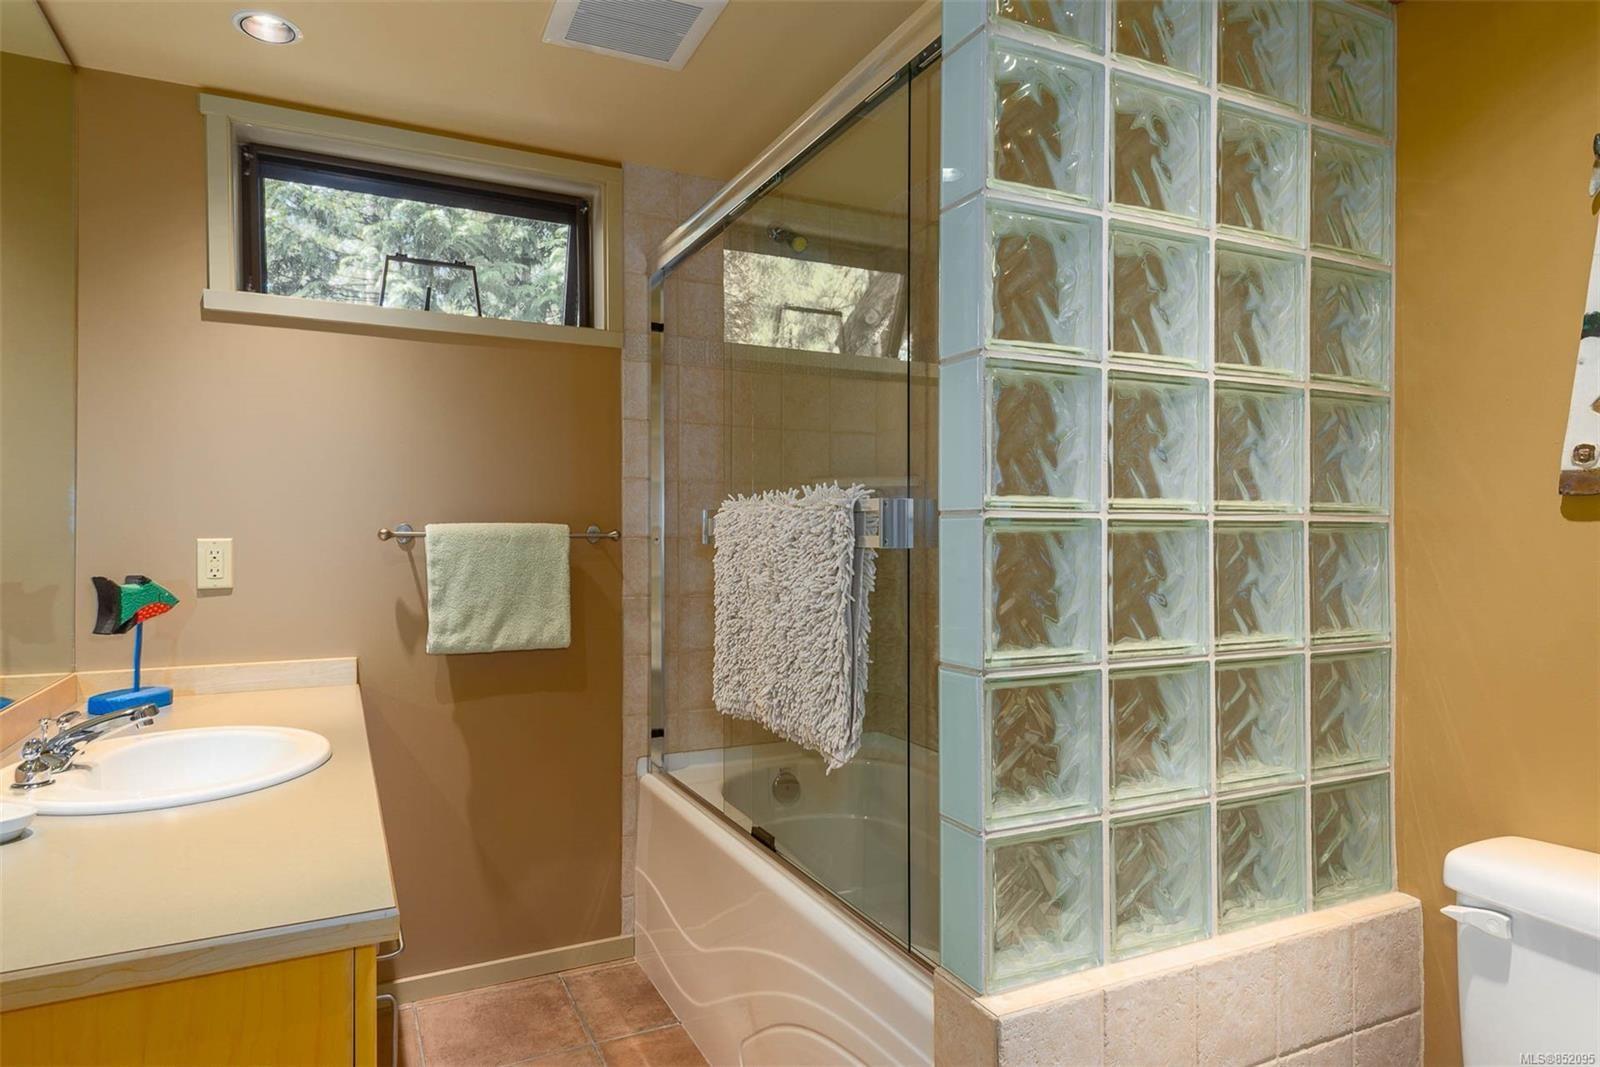 Photo 23: Photos: 236 McGill Rd in : GI Salt Spring House for sale (Gulf Islands)  : MLS®# 852095